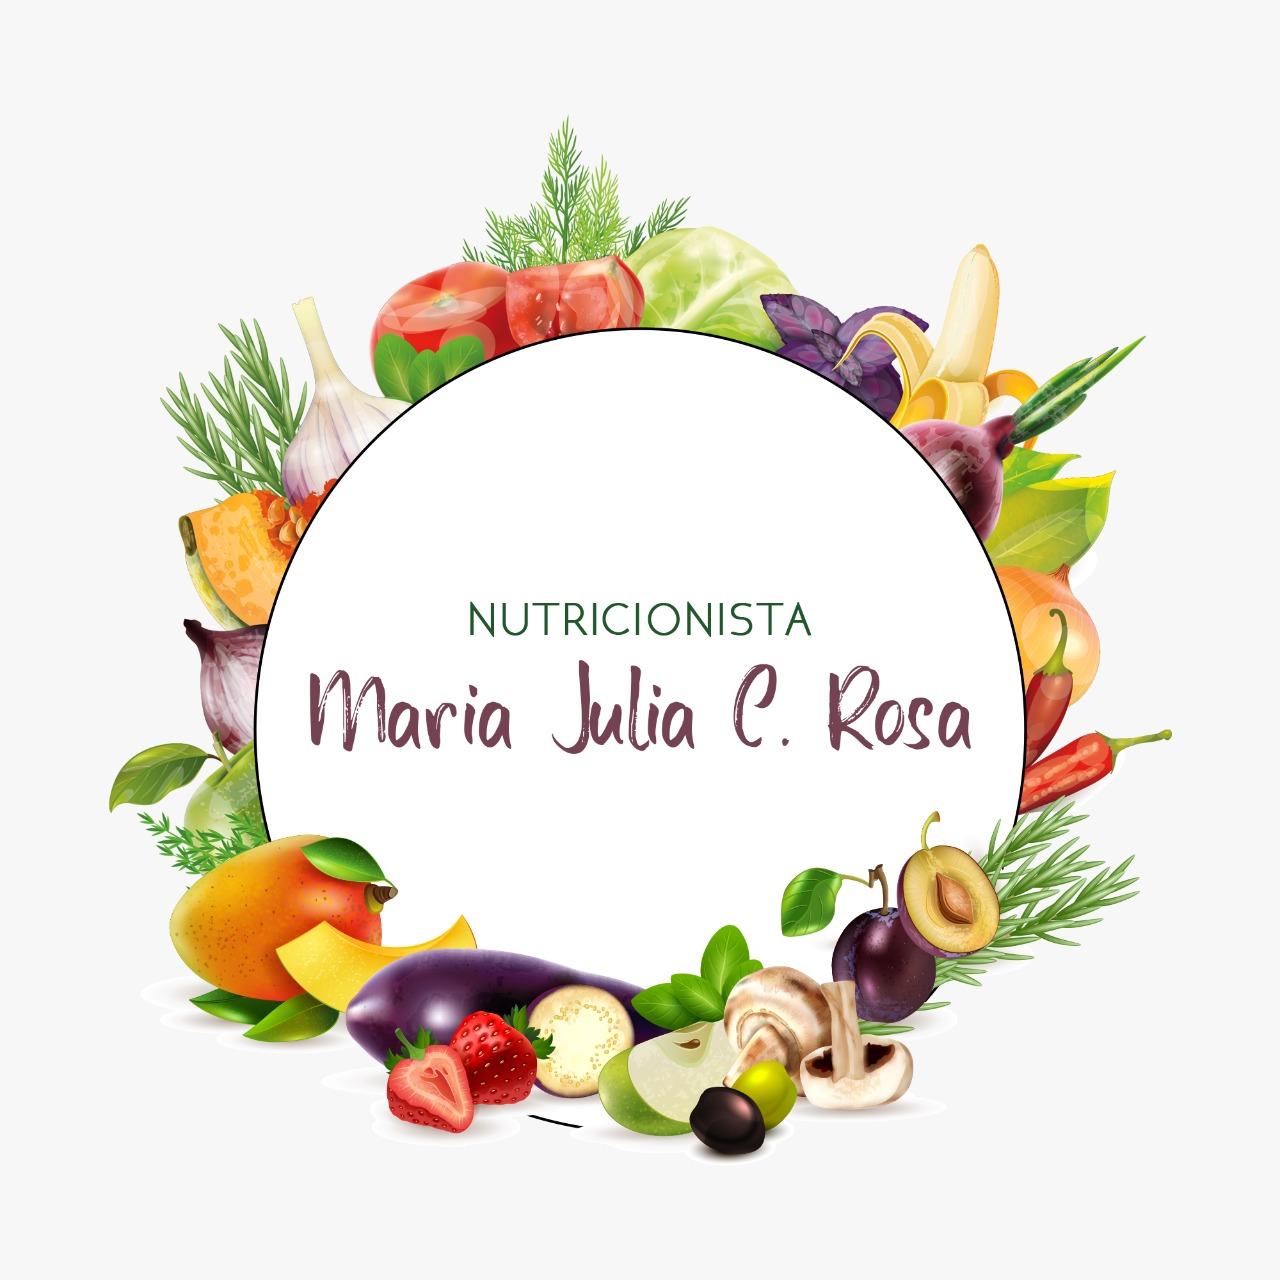 Nutricionista Maria Julia Rosa